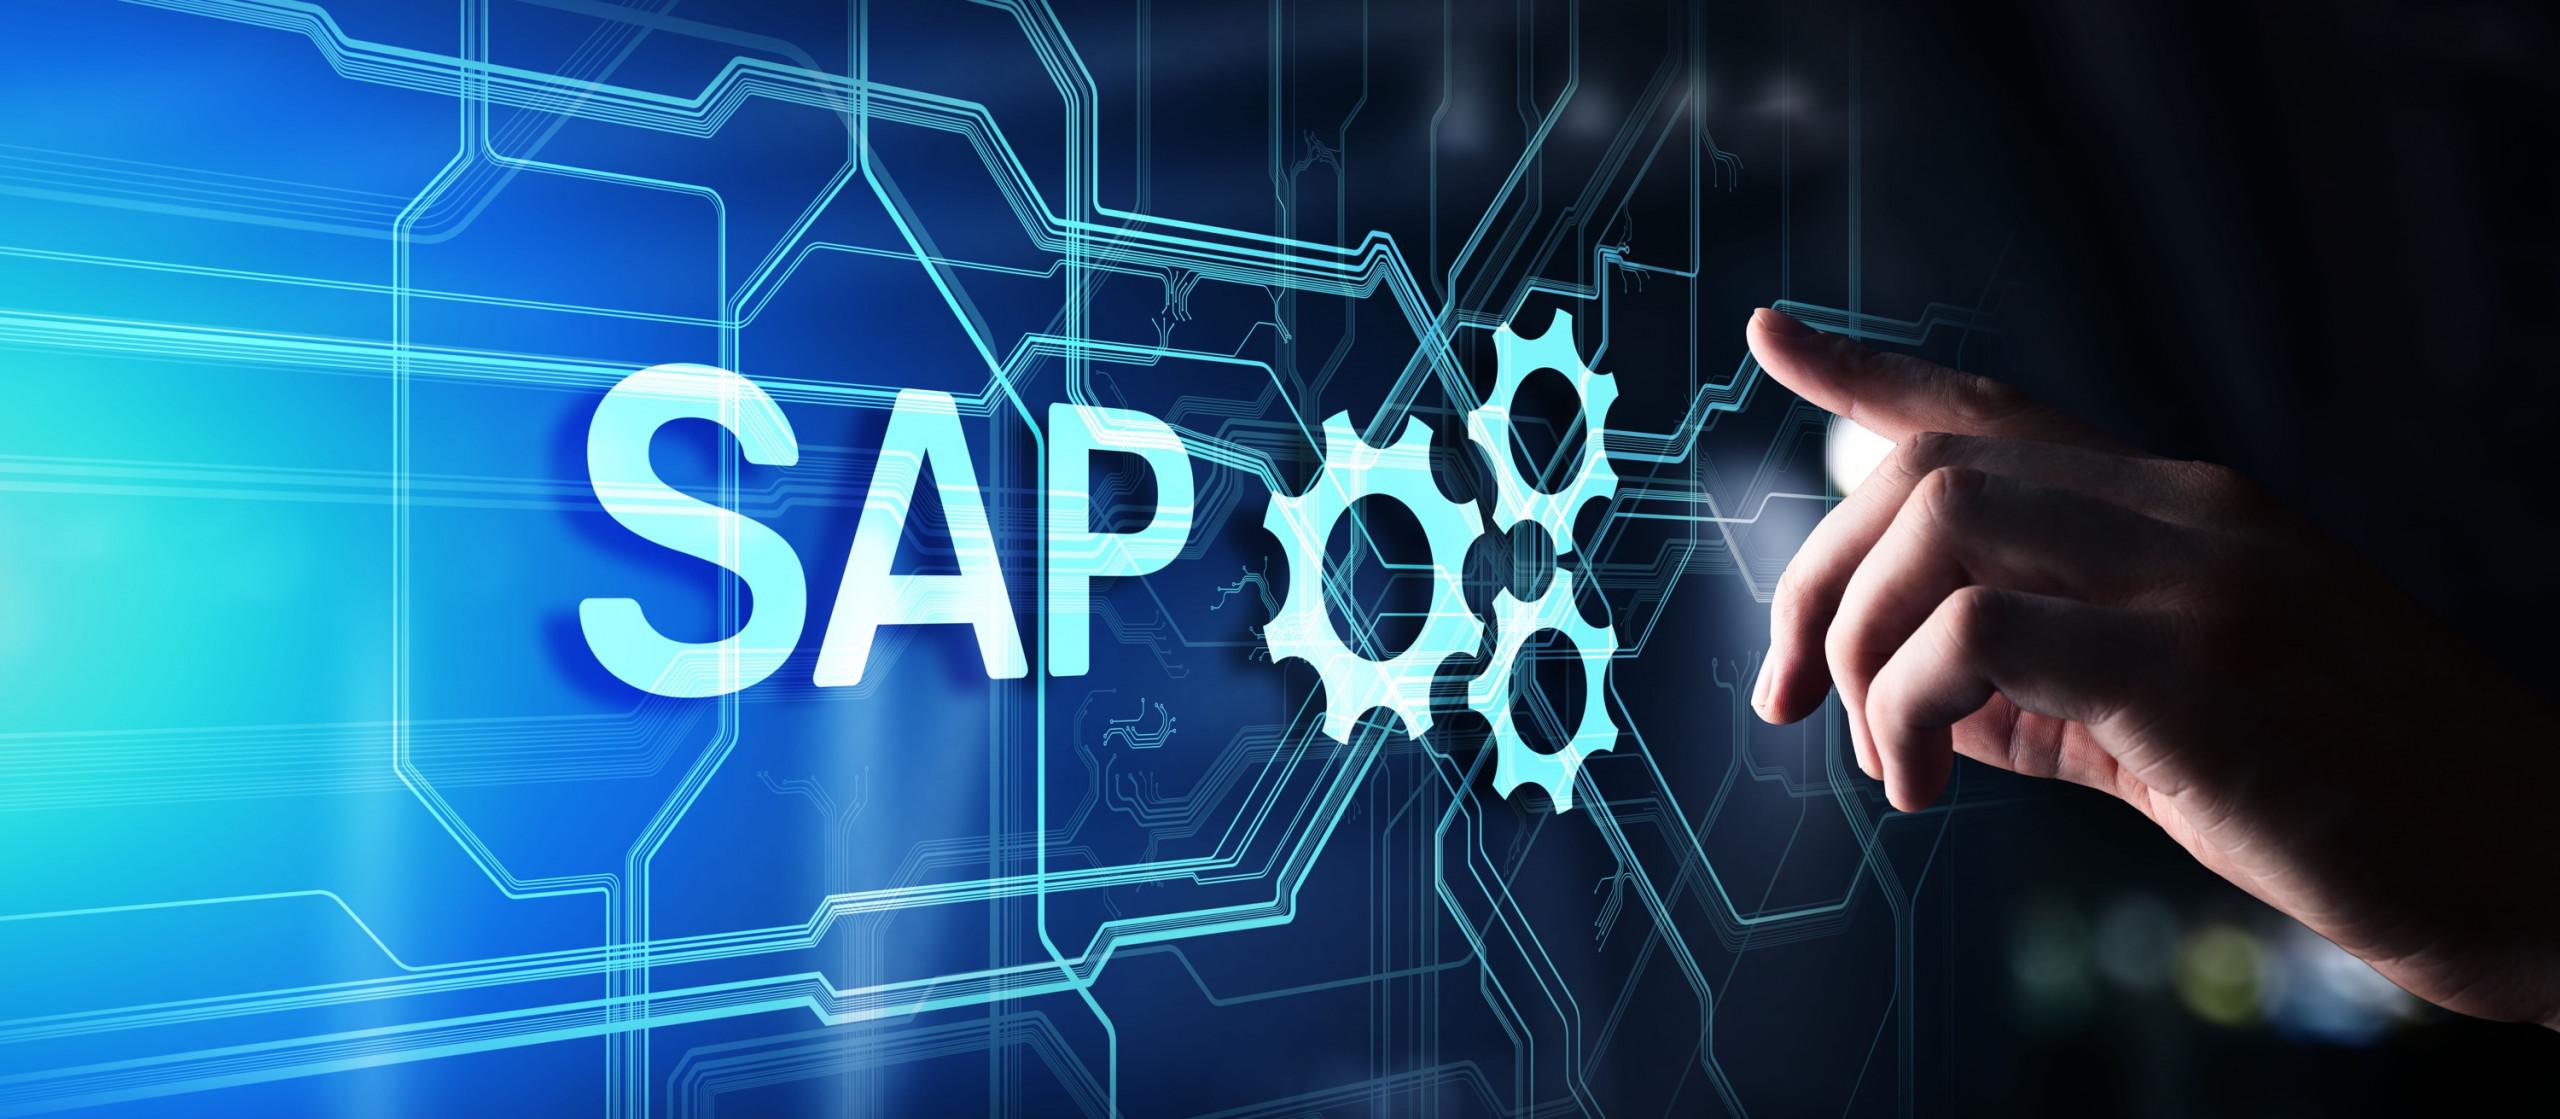 SAP Ariba Partner in Malaysia the